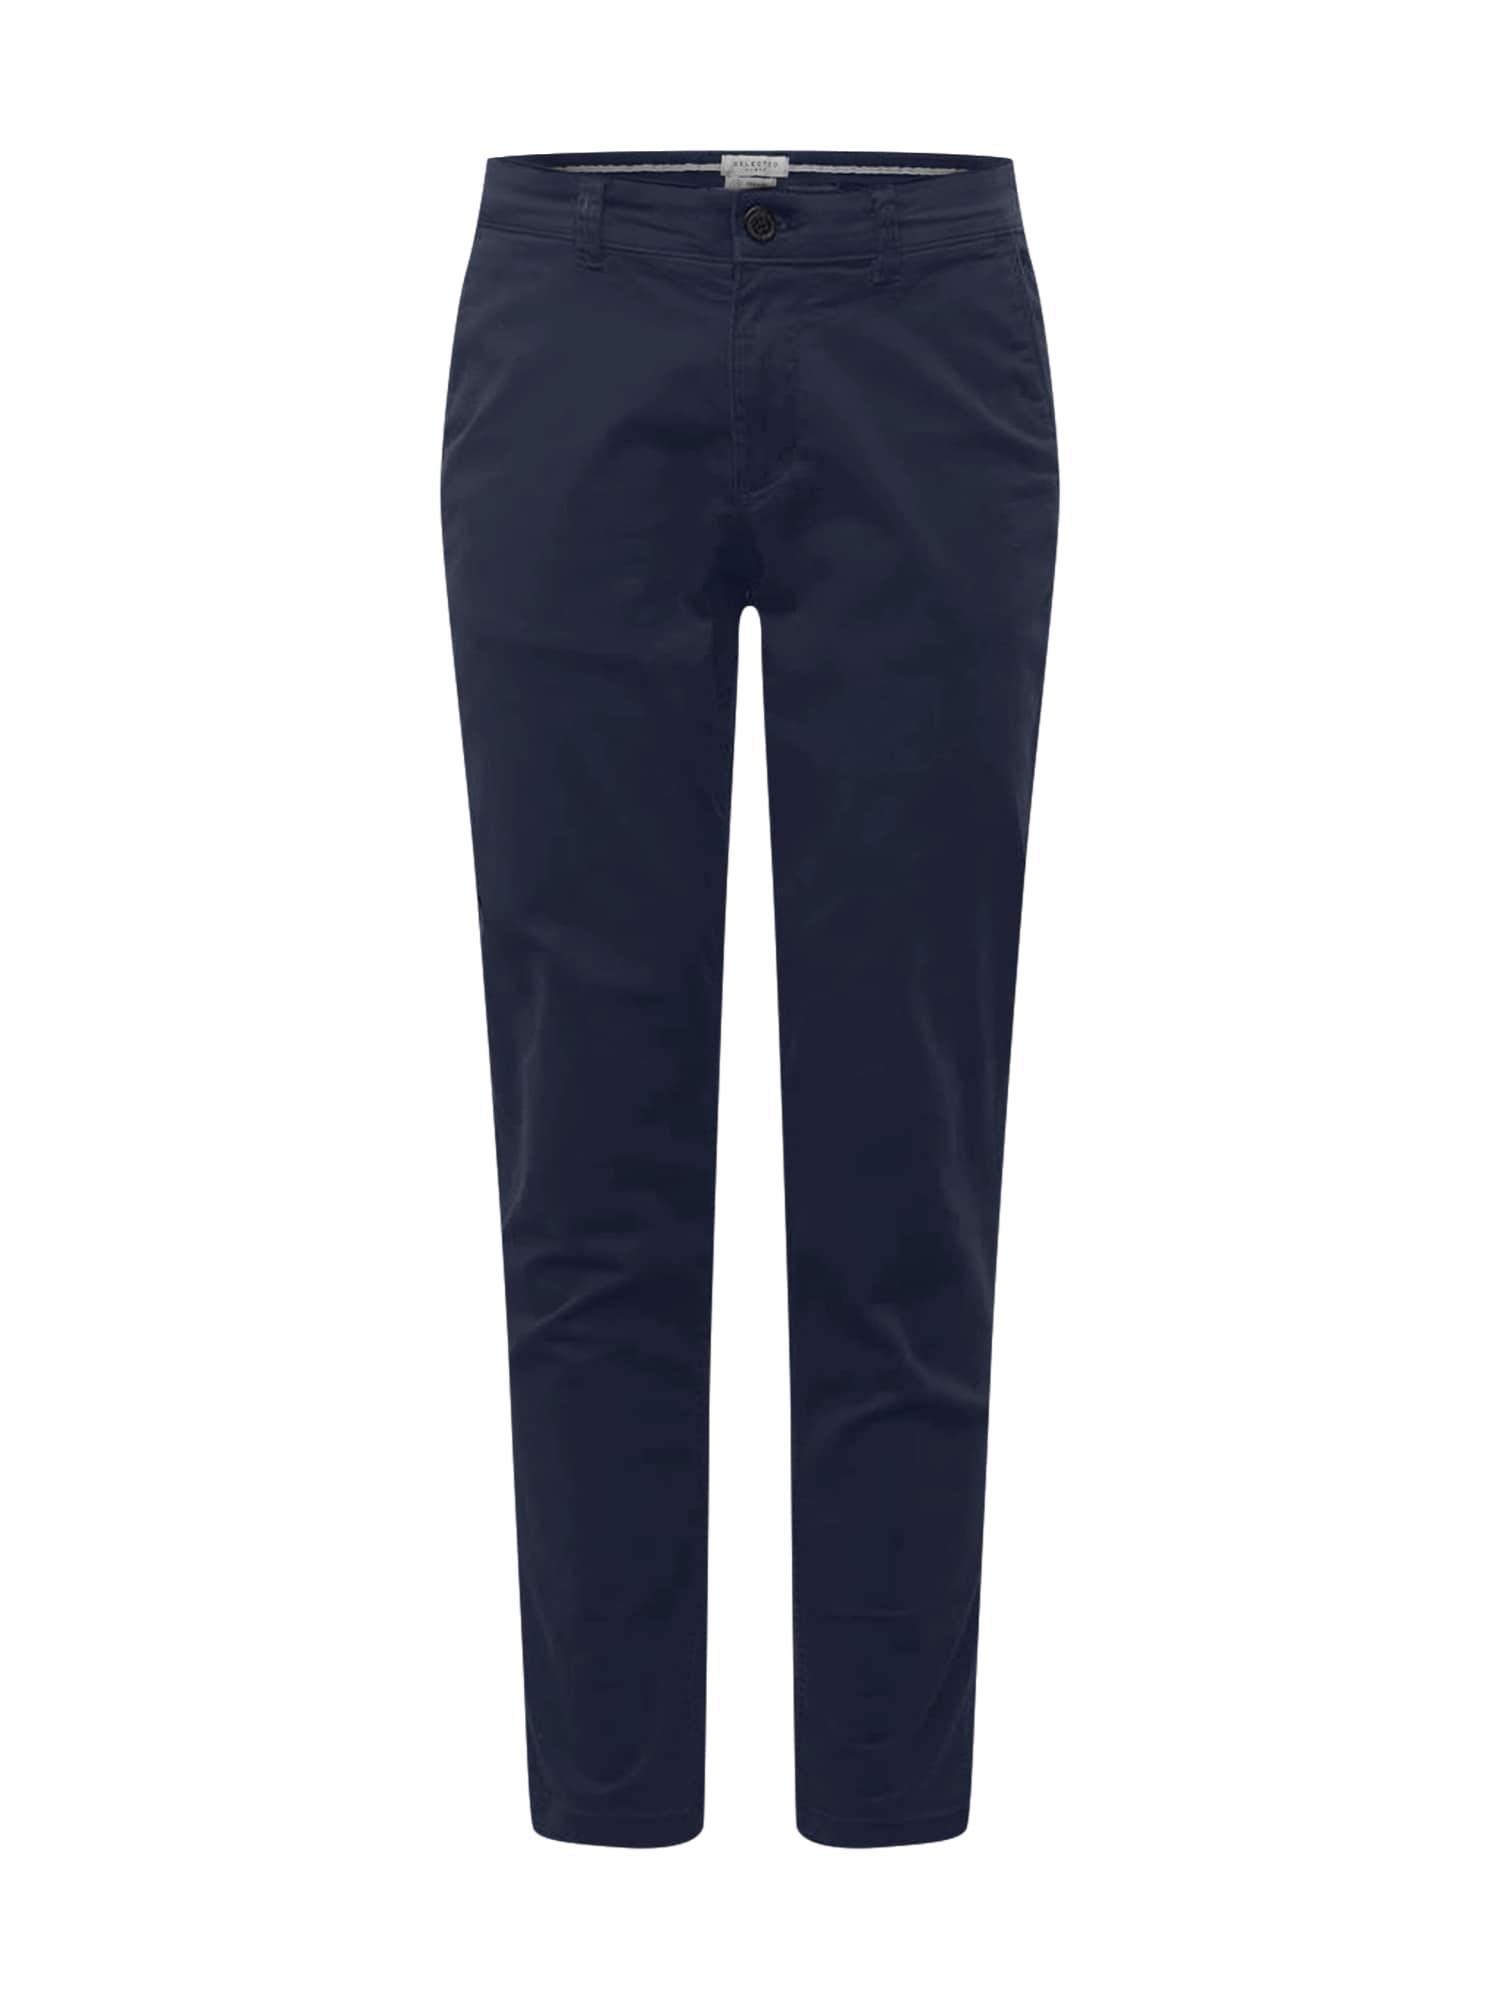 SELECTED HOMME Pantalon chino 'NEW PARIS'  - Bleu - Taille: 29 - male